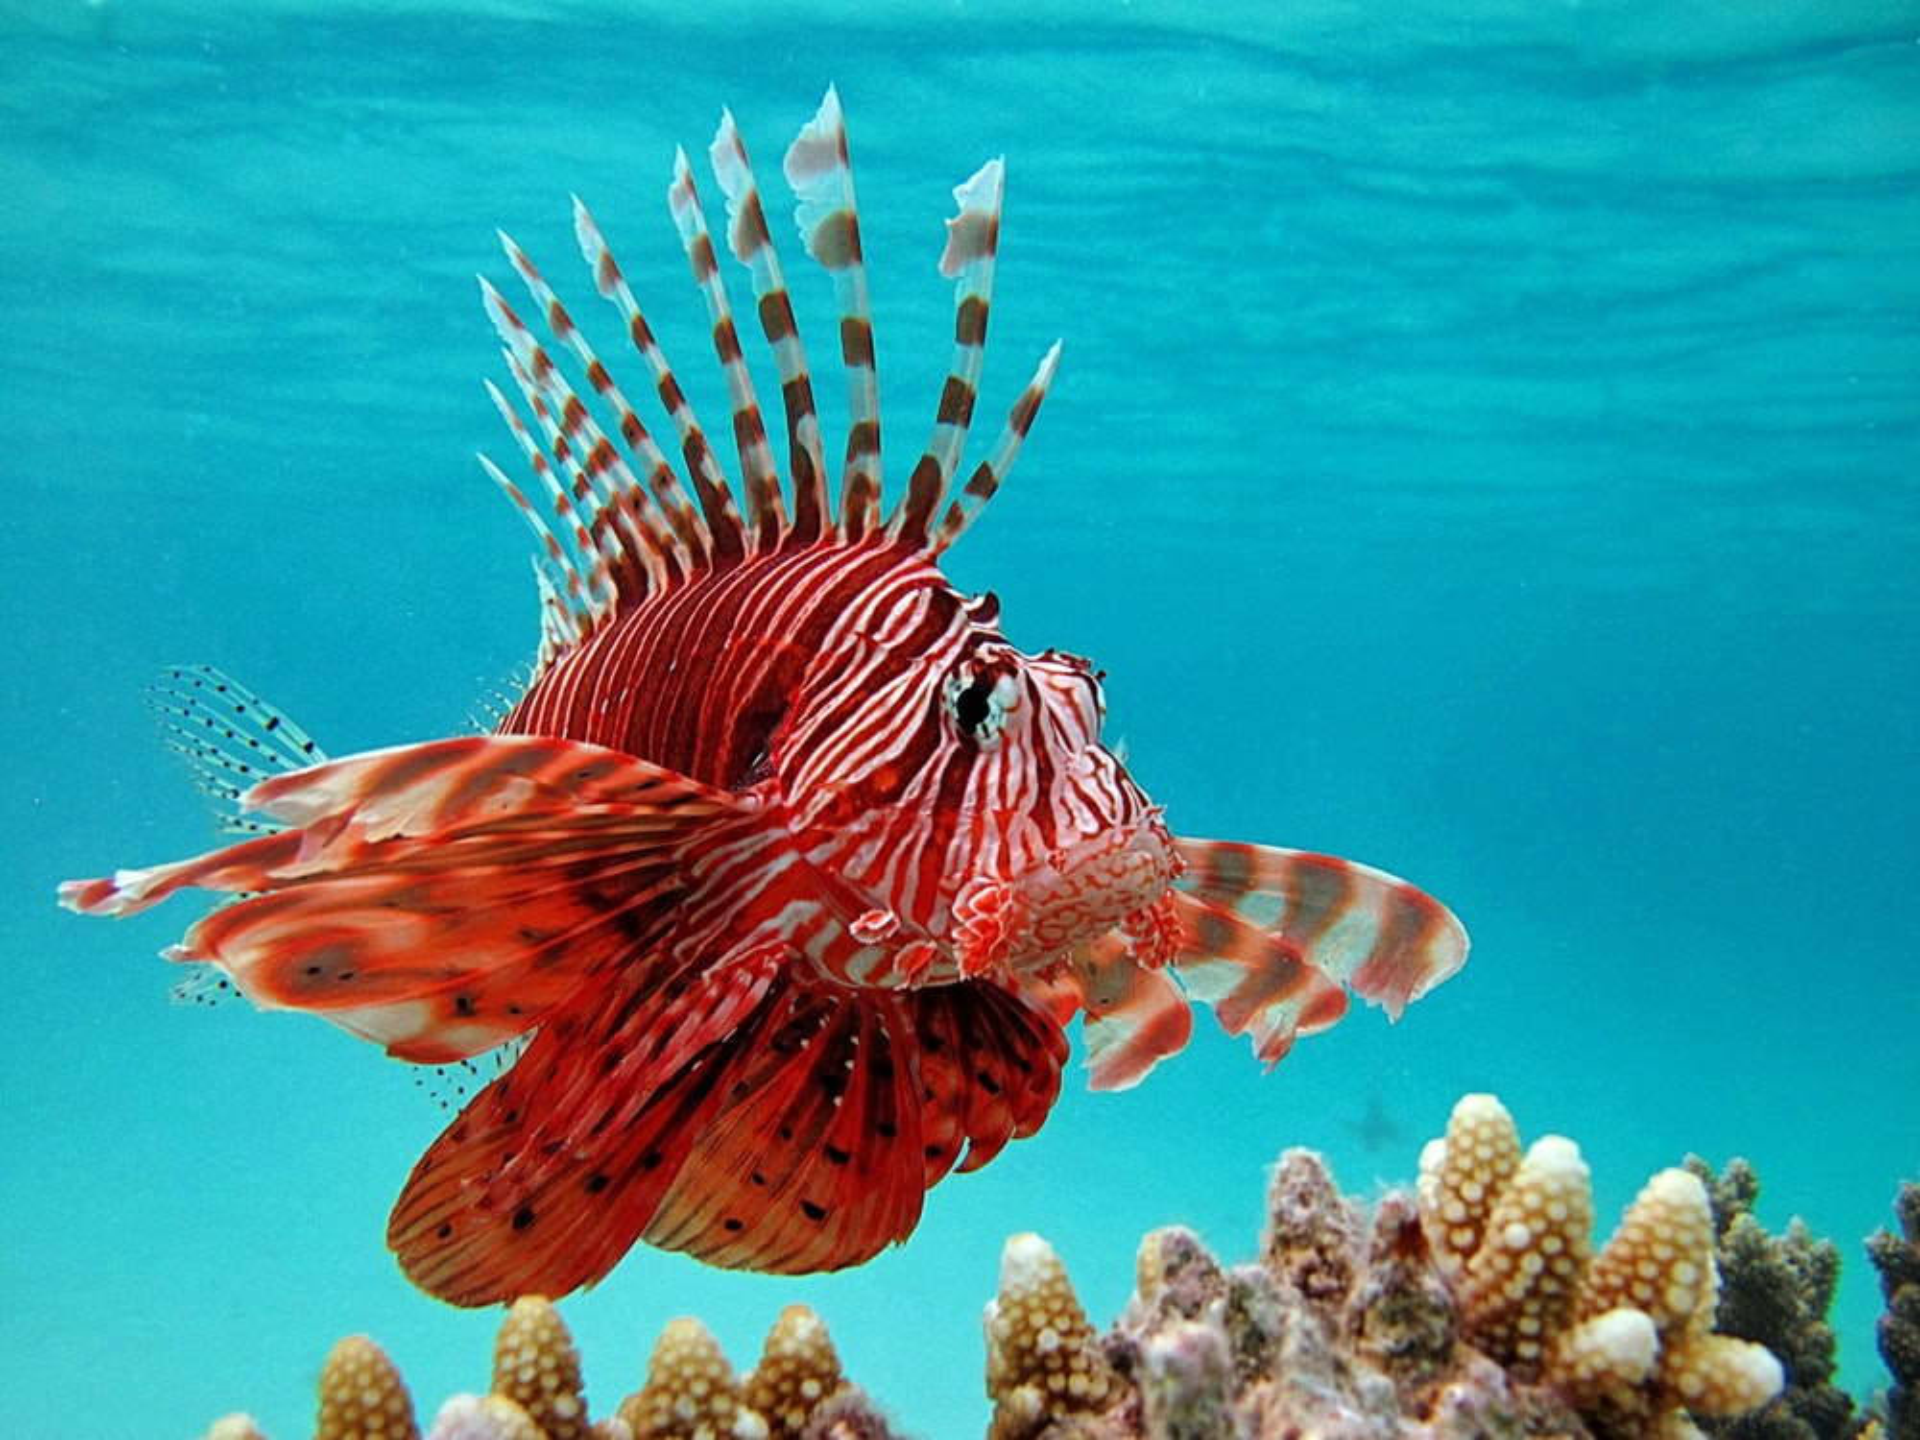 Fish Invasions of the Mediterranean Sea